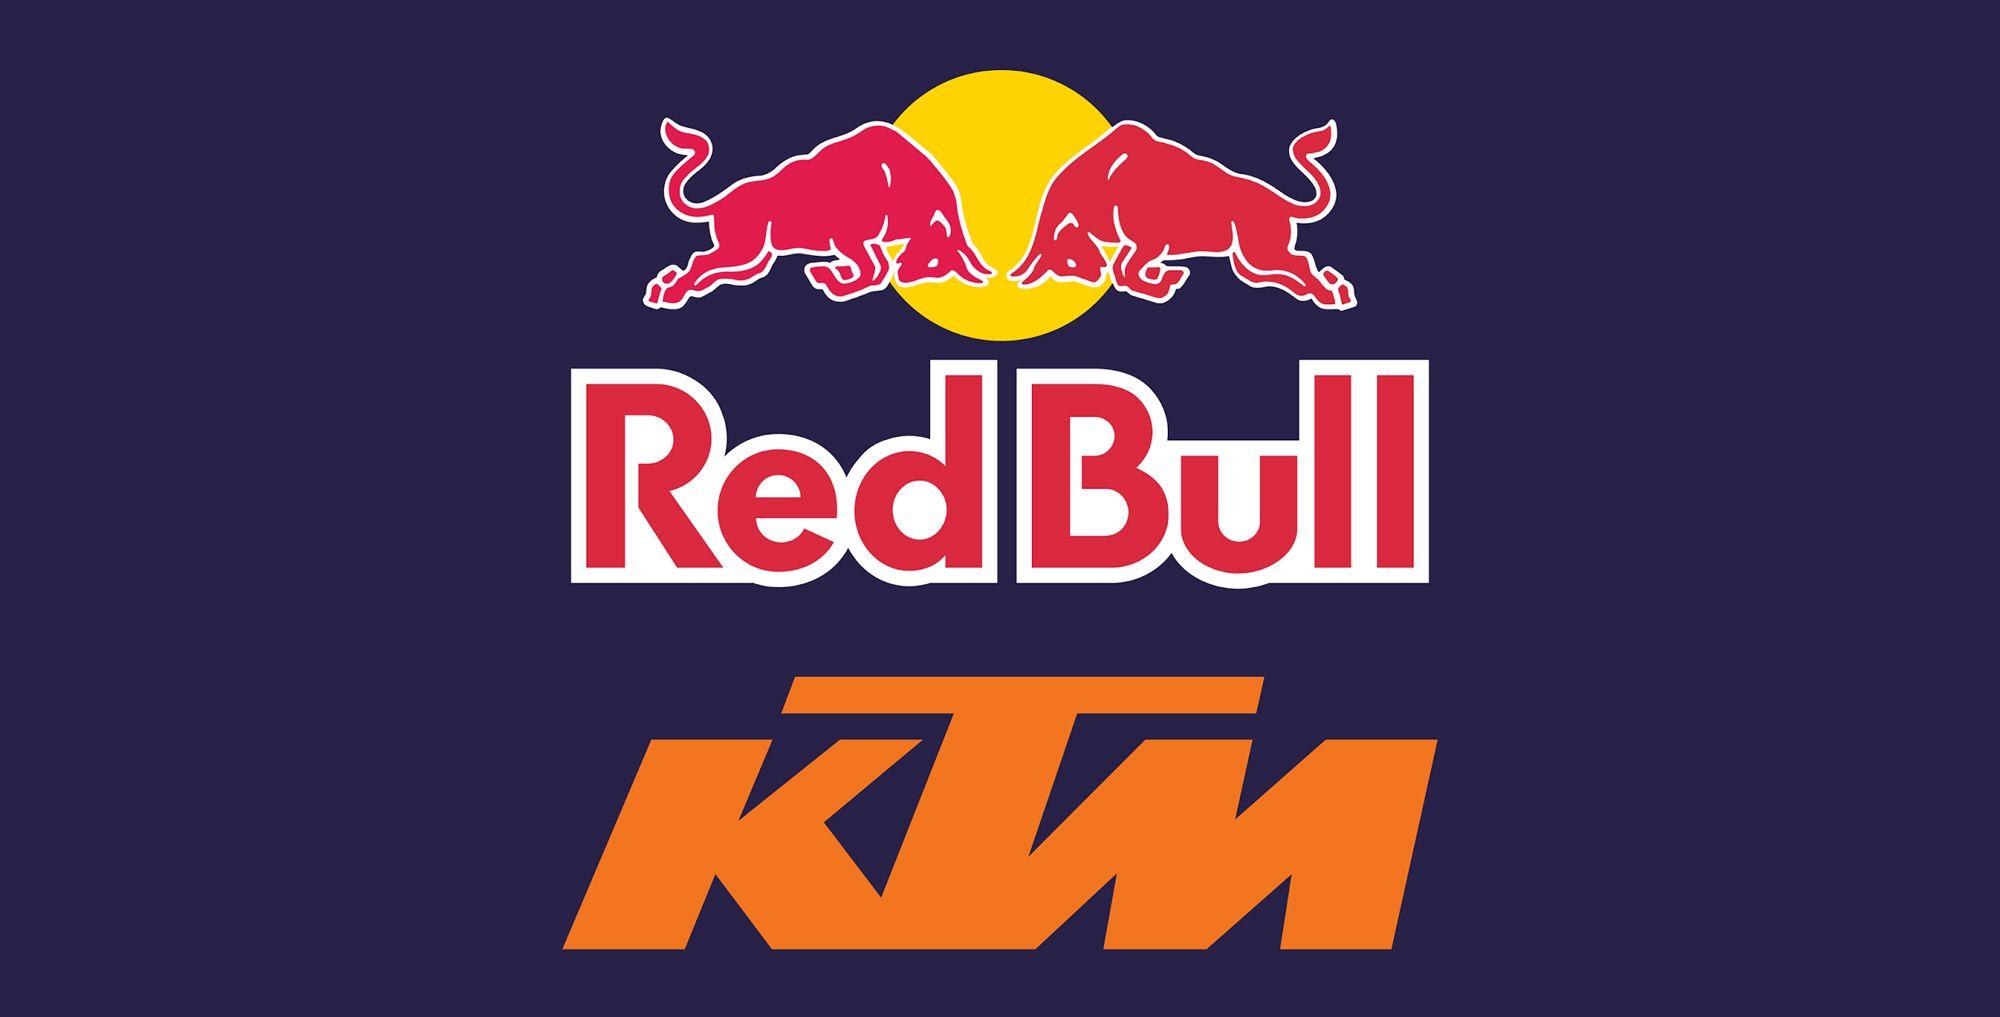 Red Bull Ktm Motogp Wallpaper